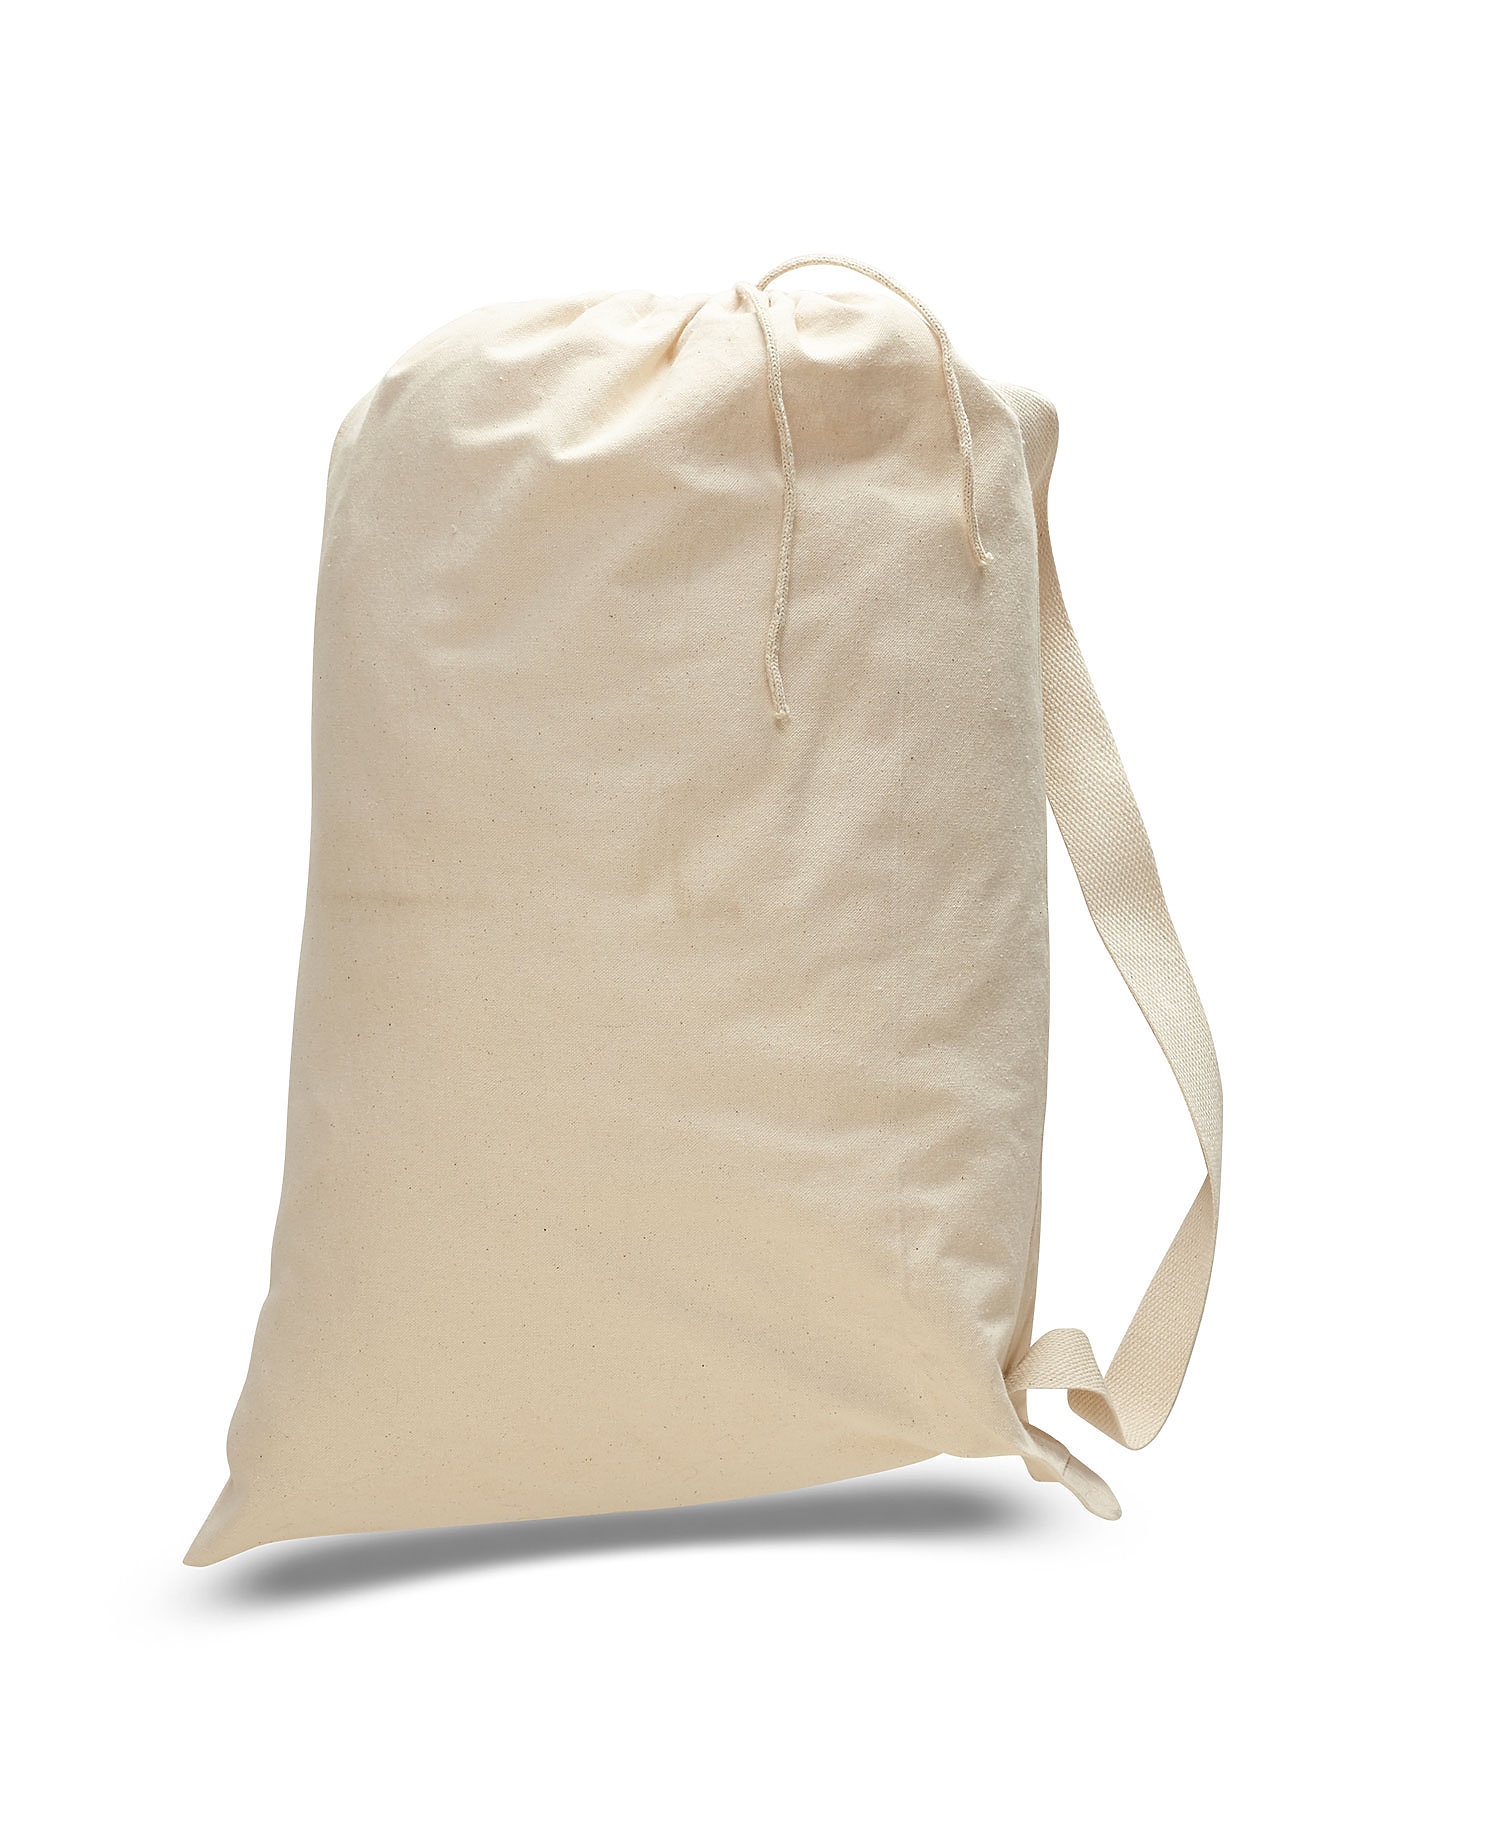 Q-Tees QLB - Canvas Drawstring Bag